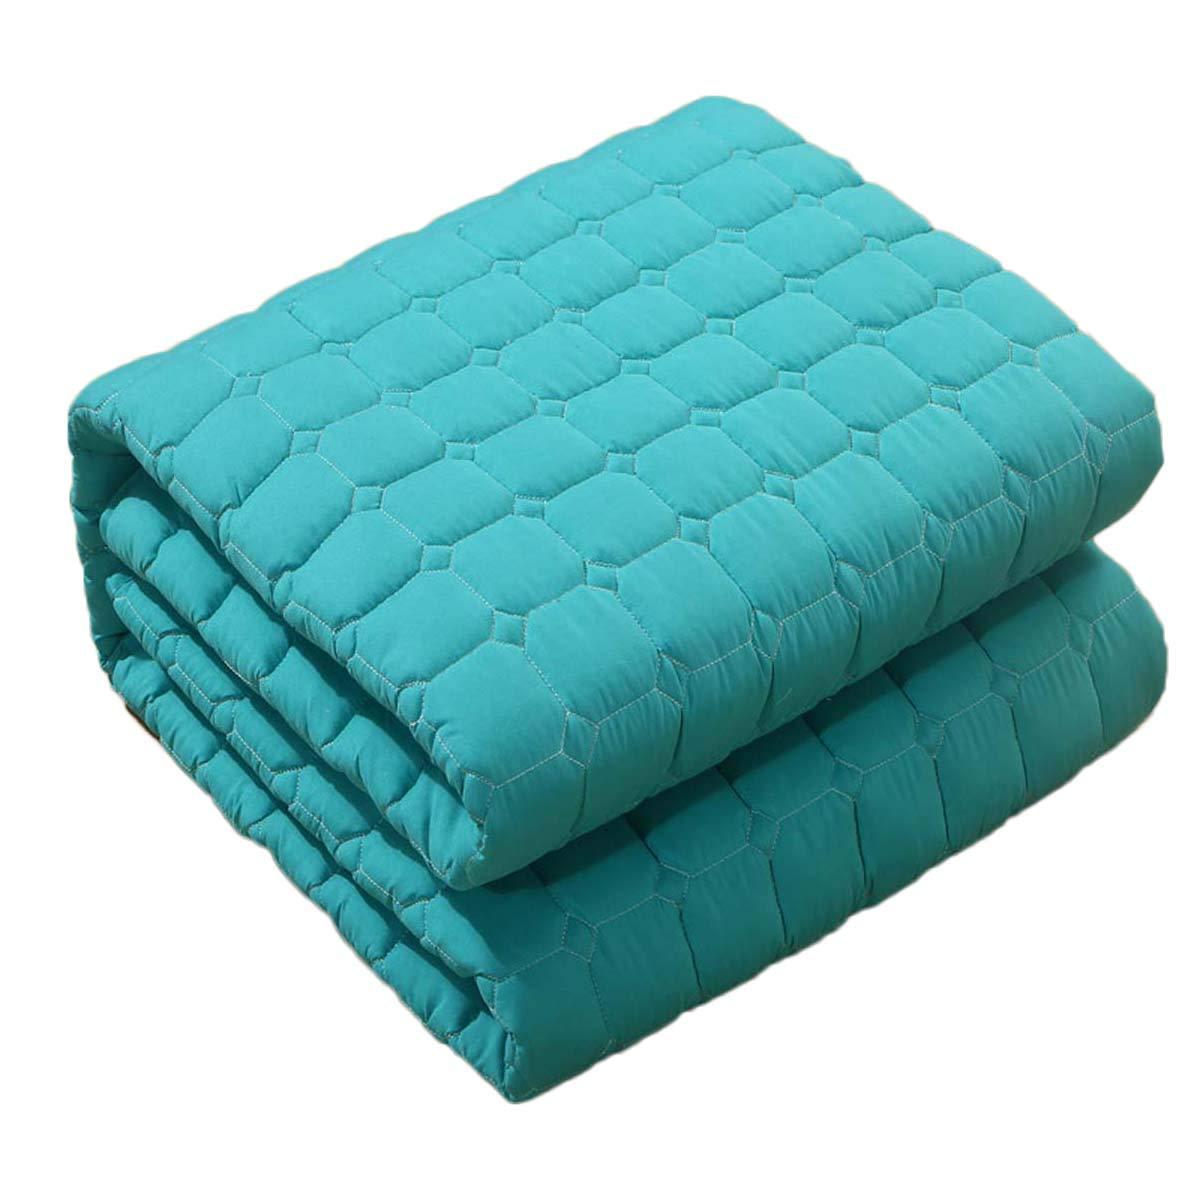 LYBFNN Futon Furniture Traditional Japanese Floor Futon Mattresses, Foldable Cushion Mats, Yoga, Meditaion Single Double Size,E:Blue,120200cm by LYBFNN